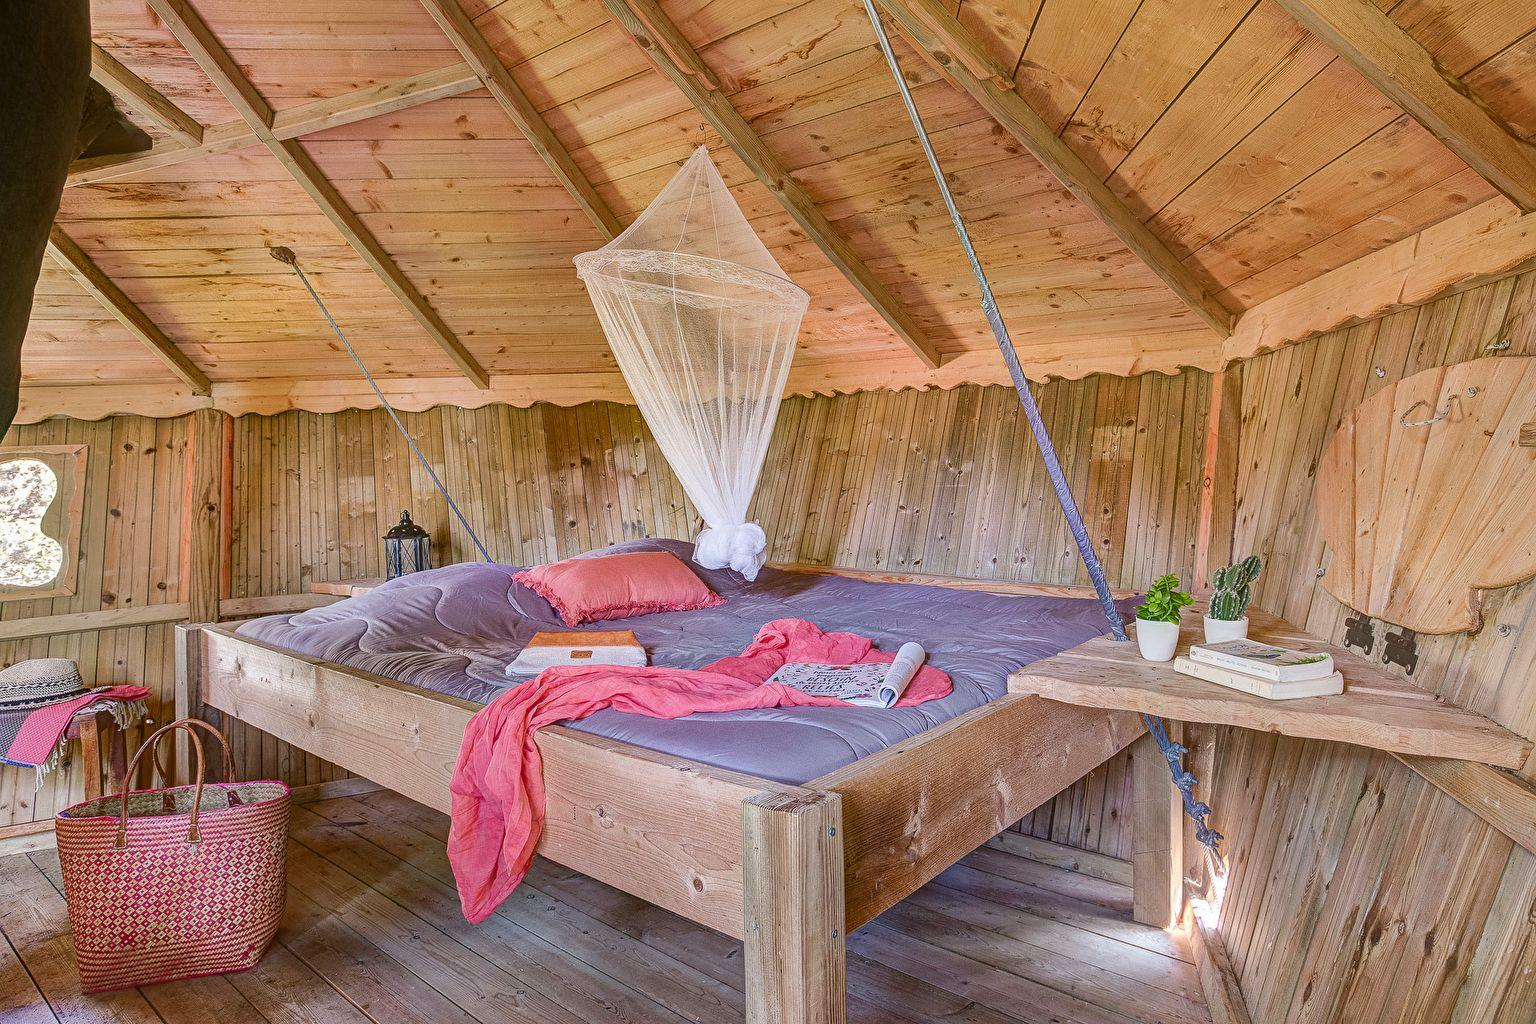 Location - Cabane Dans Les Arbres Forest Camp Insolite - Camping Sandaya Les Alicourts Resort